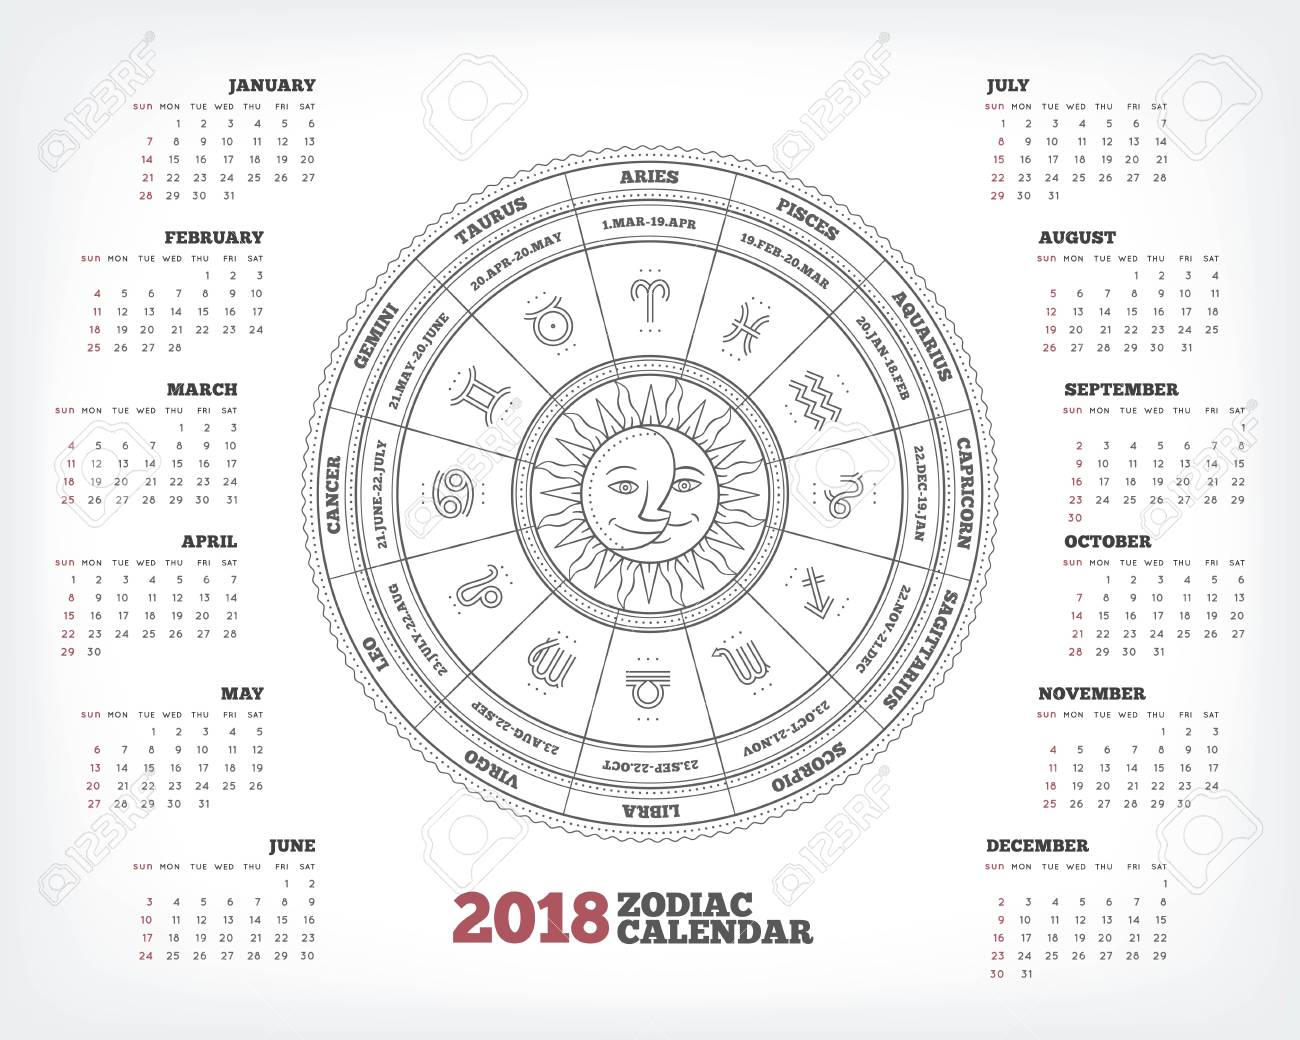 Zodiac Calendar June : Zodiac circle year calendar poster vector illustration stock